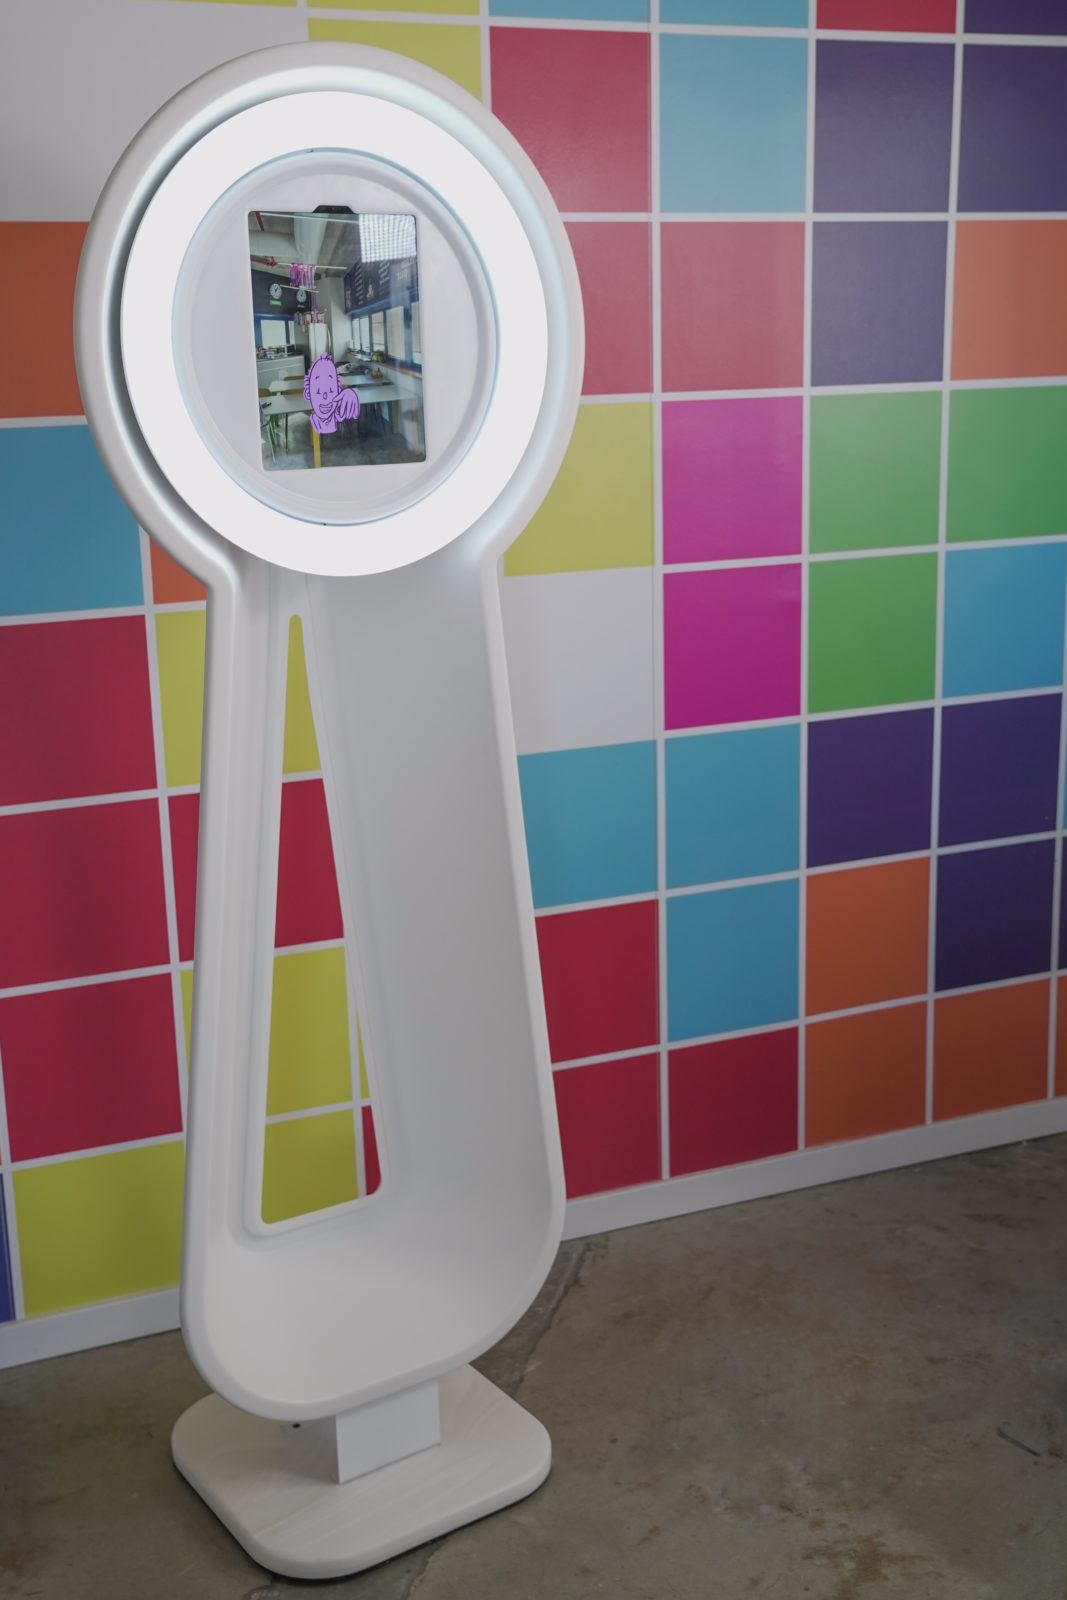 Pylon social photo booth